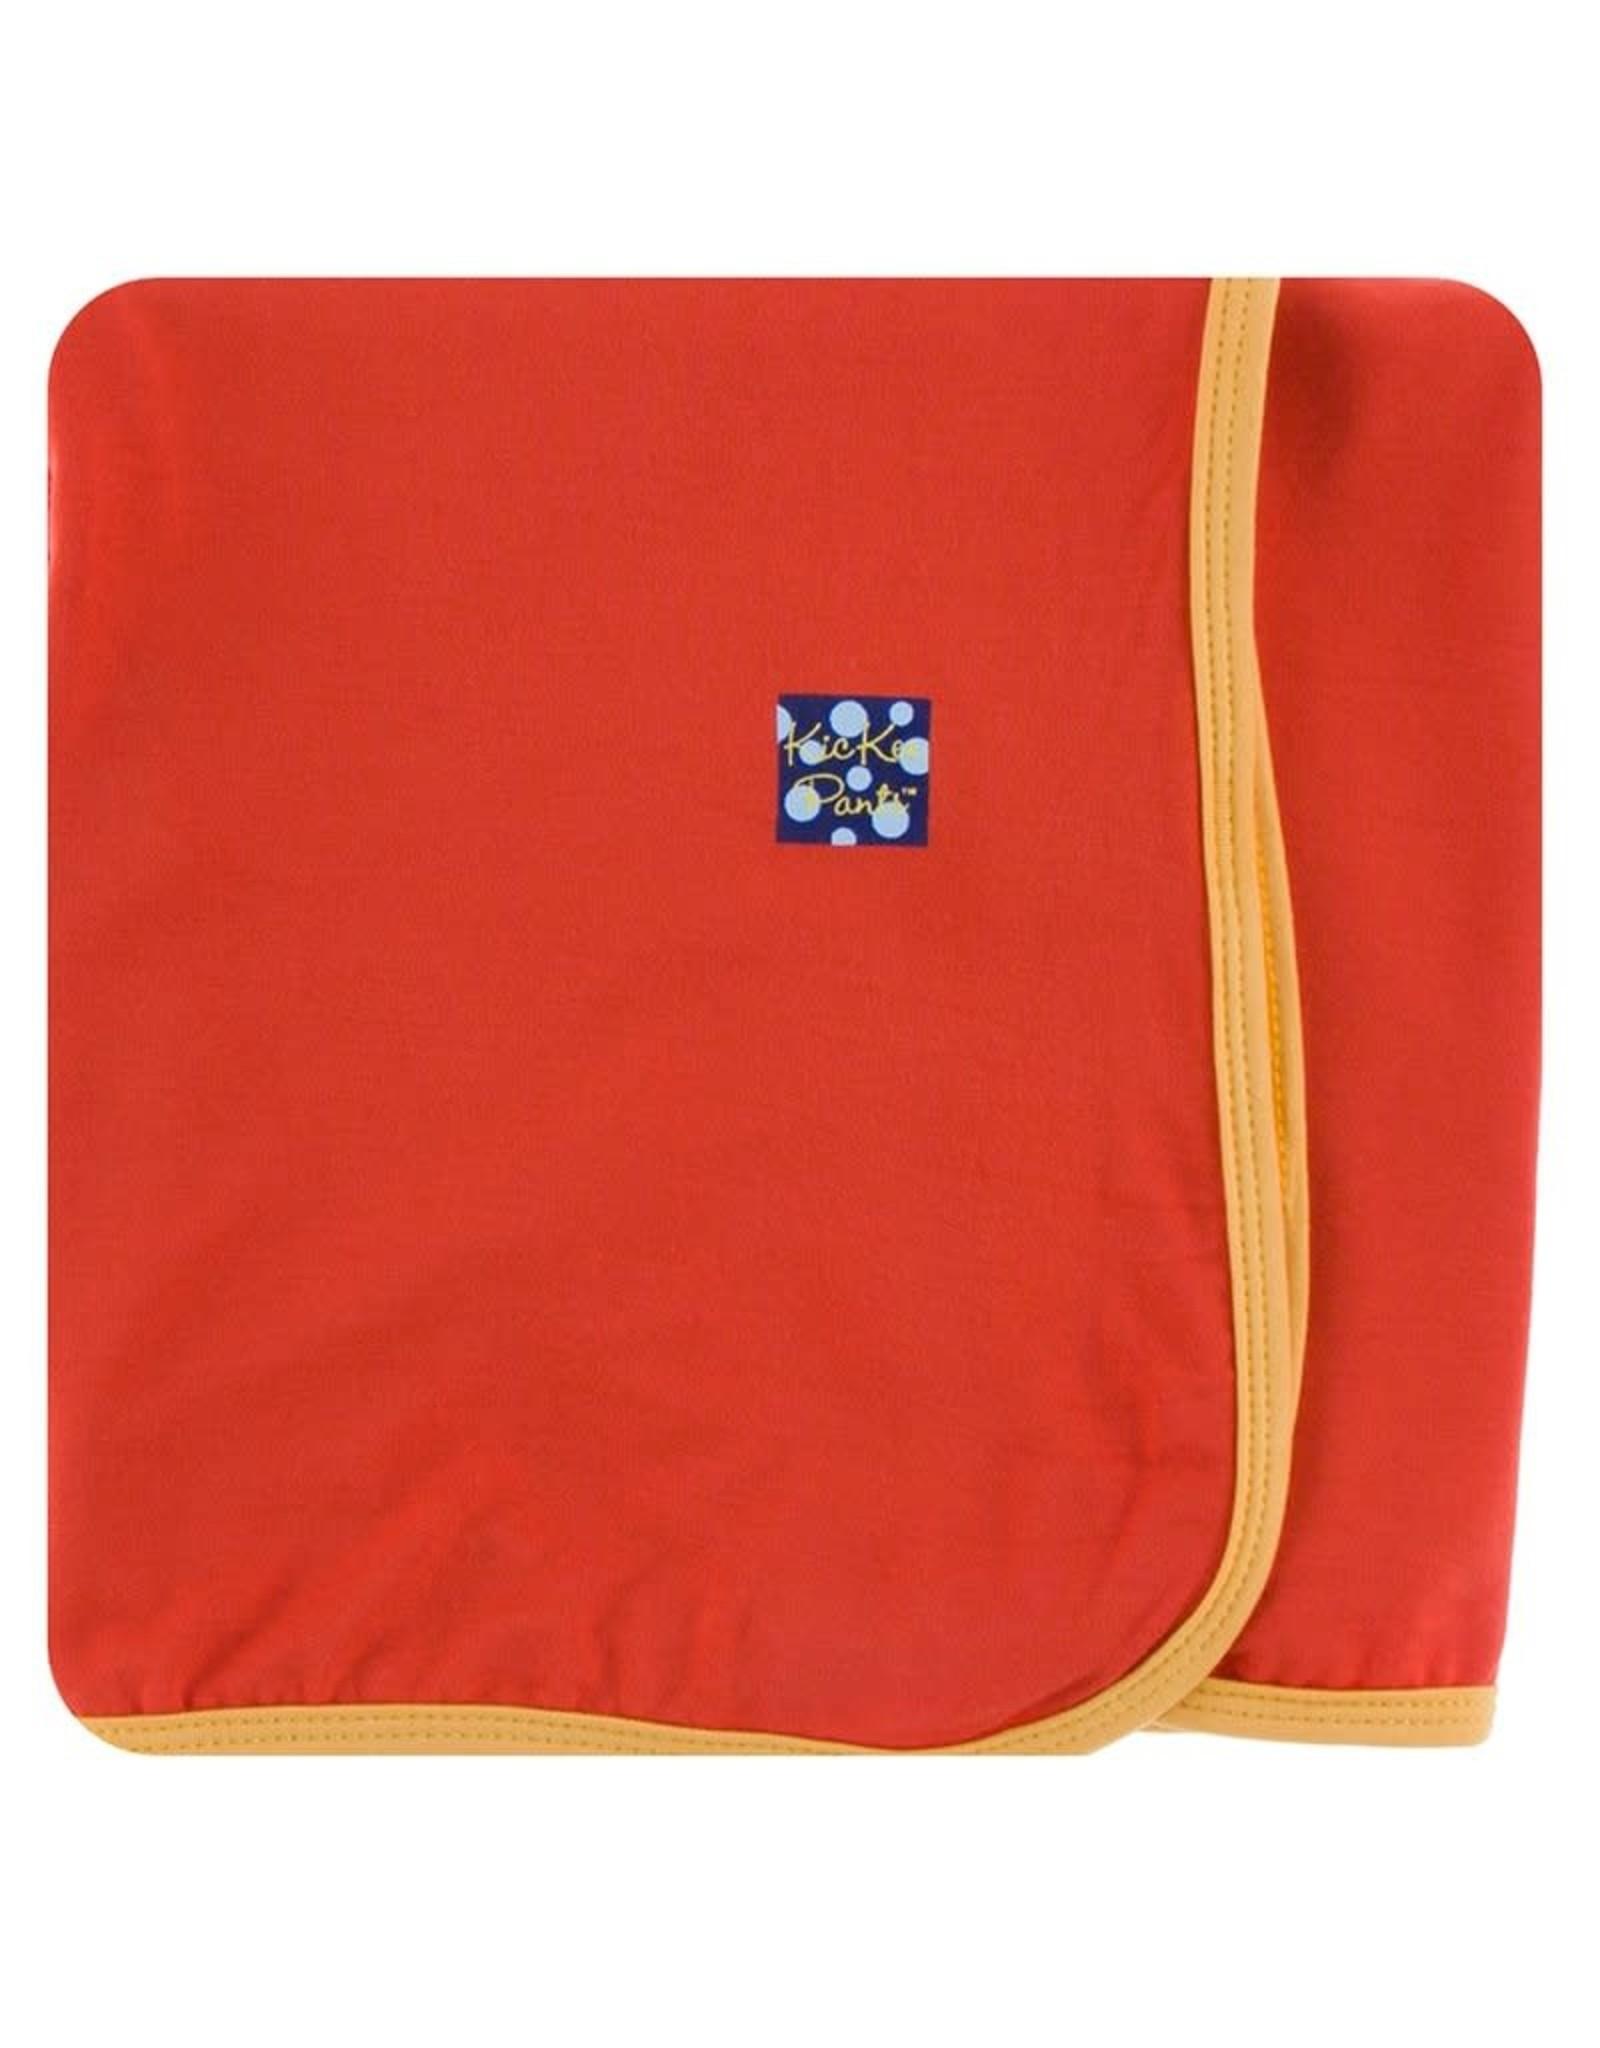 KicKee Pants Kickee Pants Swaddling Blanket, Poppy with Marigold